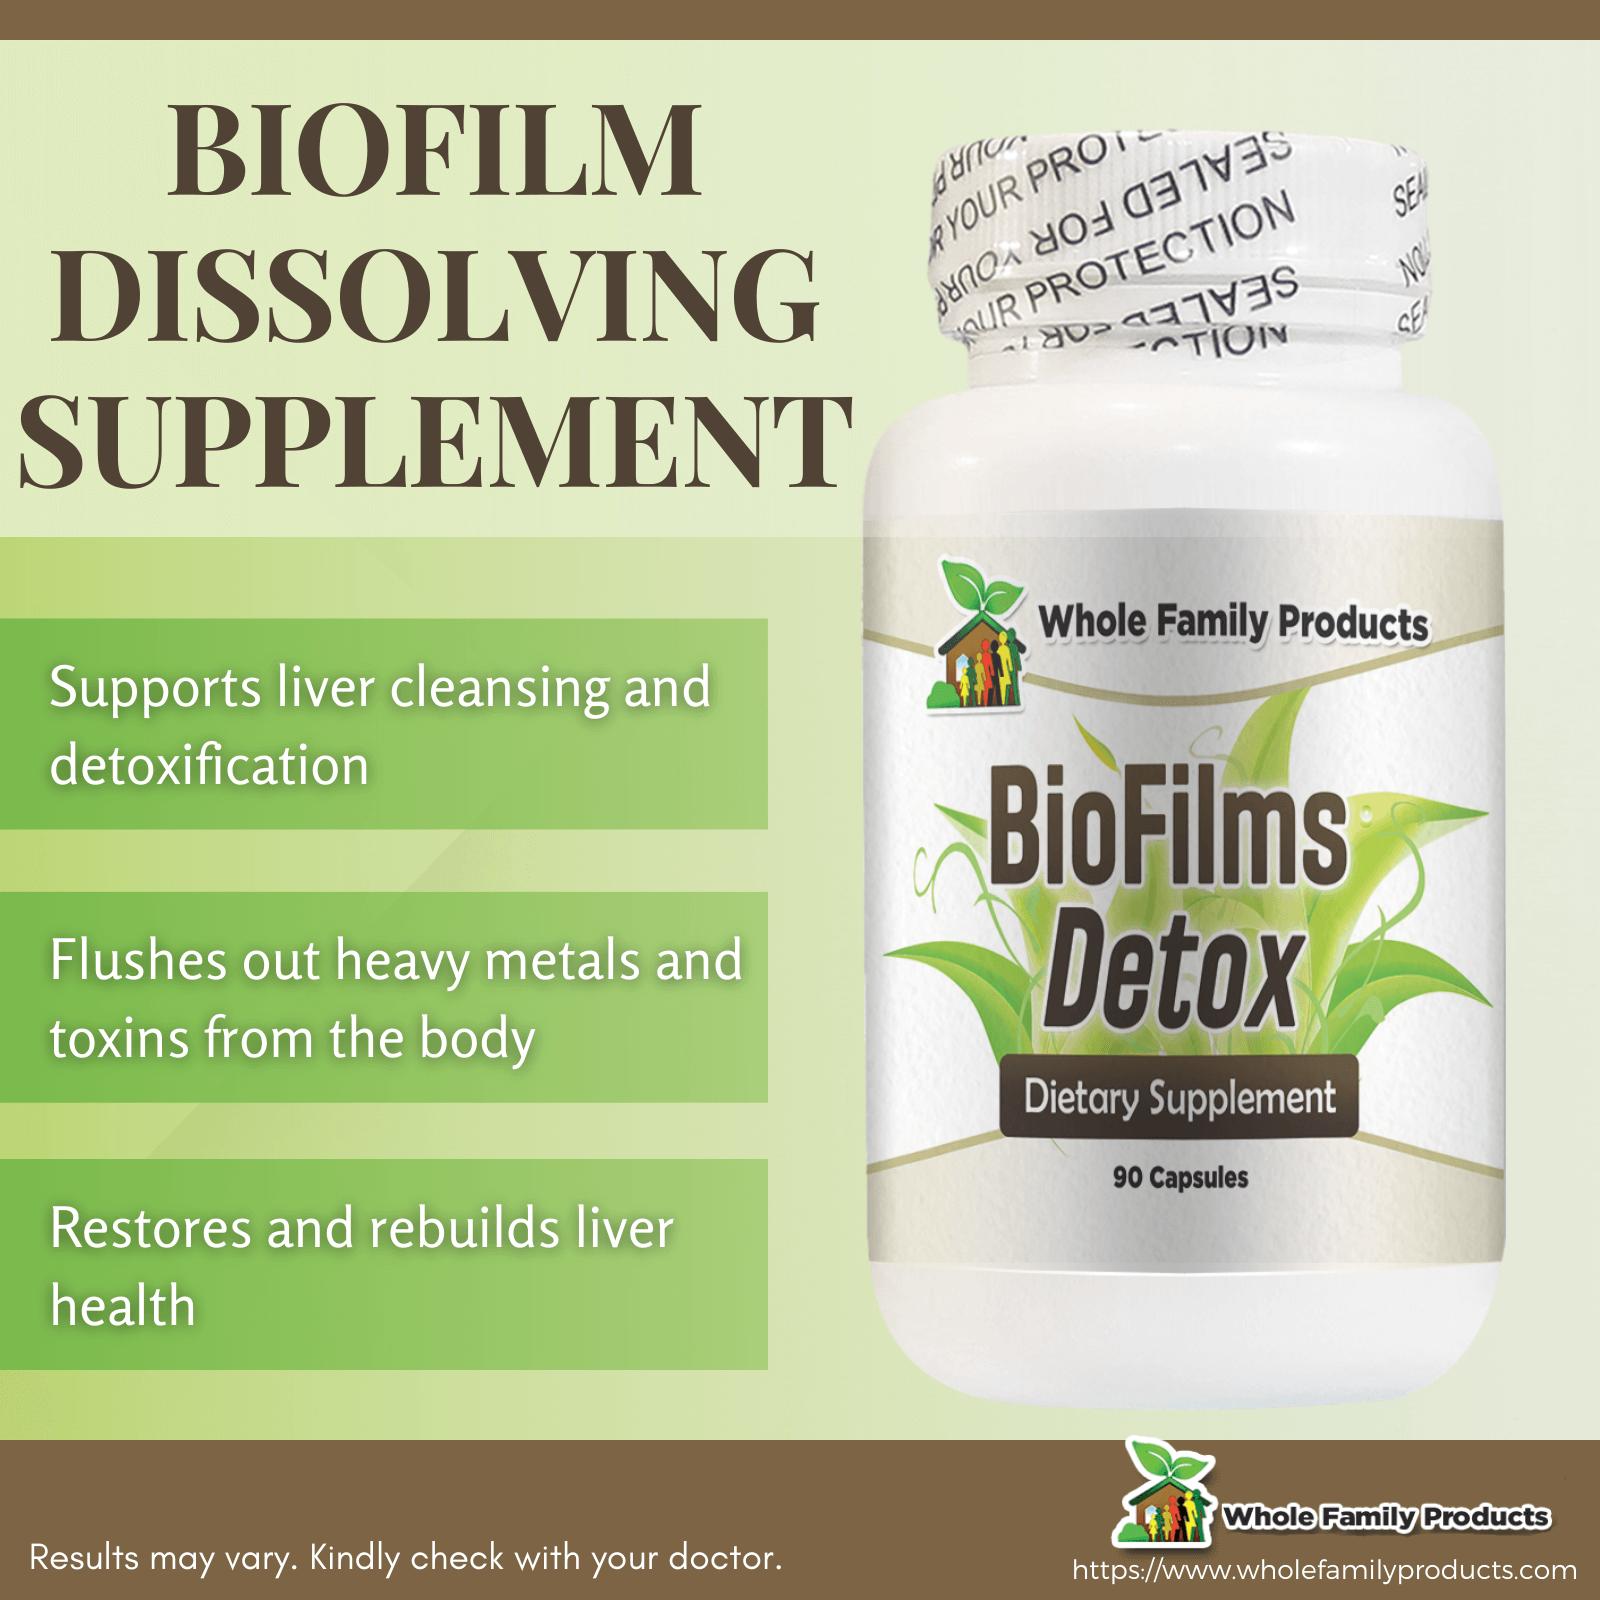 Biofilms Detox Biofilm Dissolving Supplement Infographic